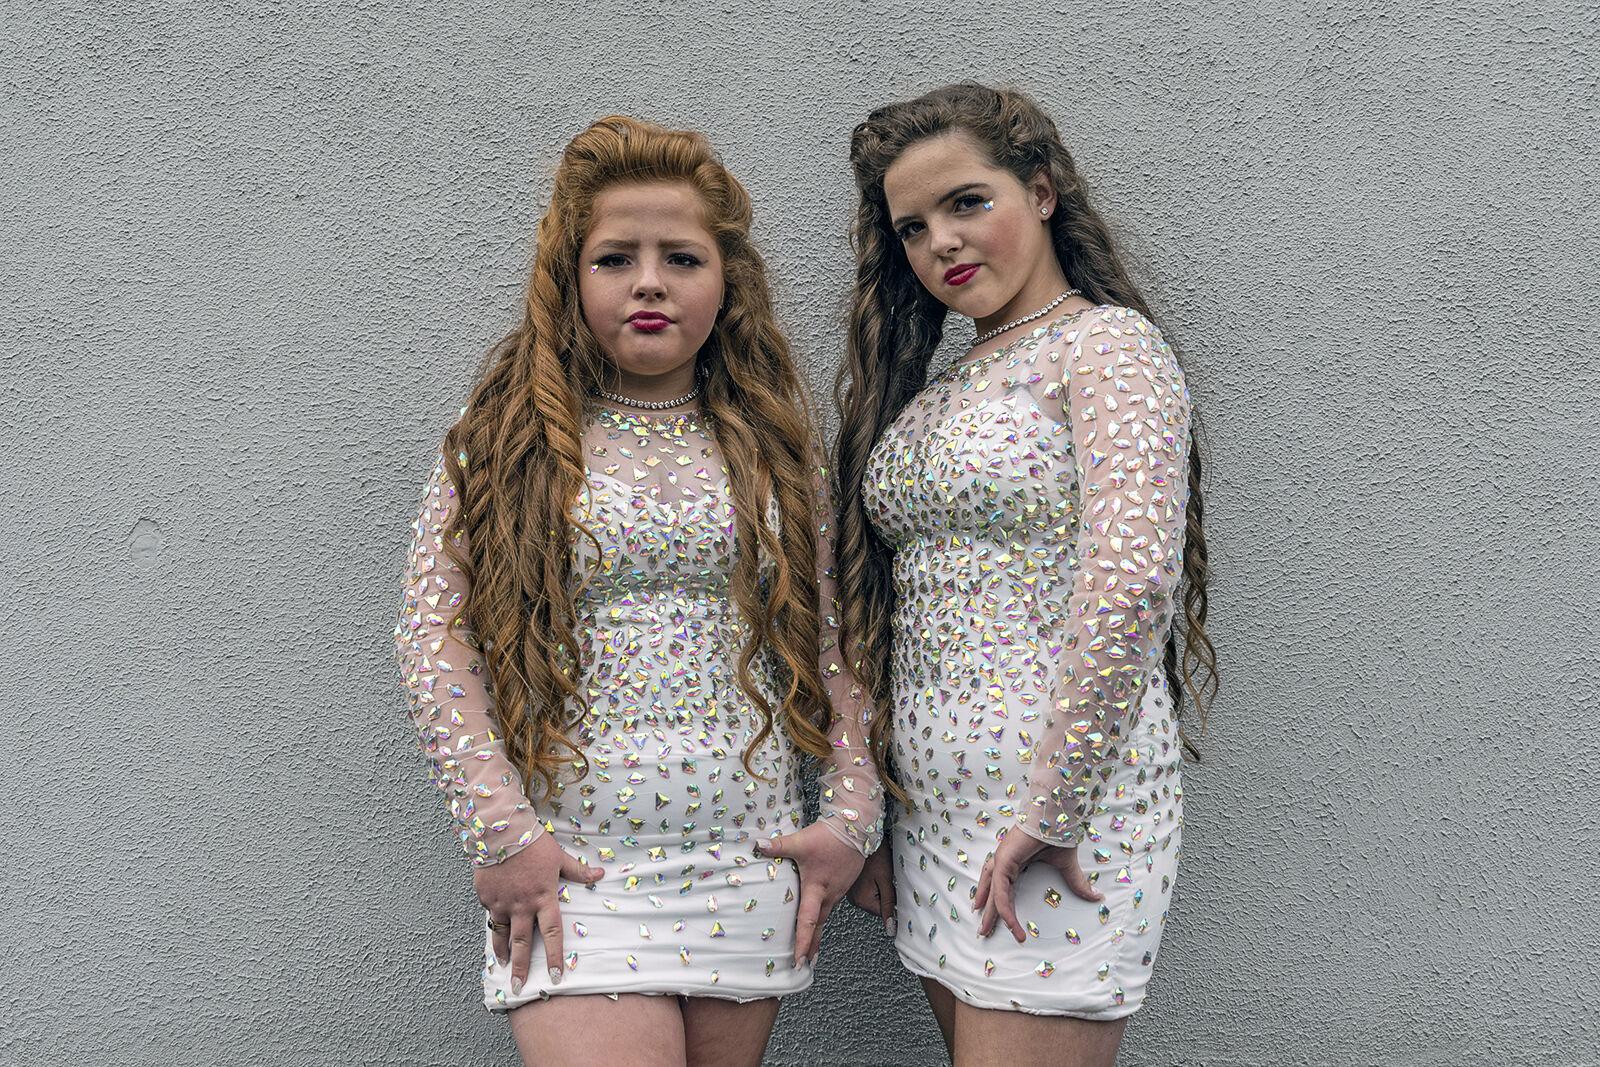 Bridget and Margaret, Fraternal Twins, Wexford, Ireland 2019